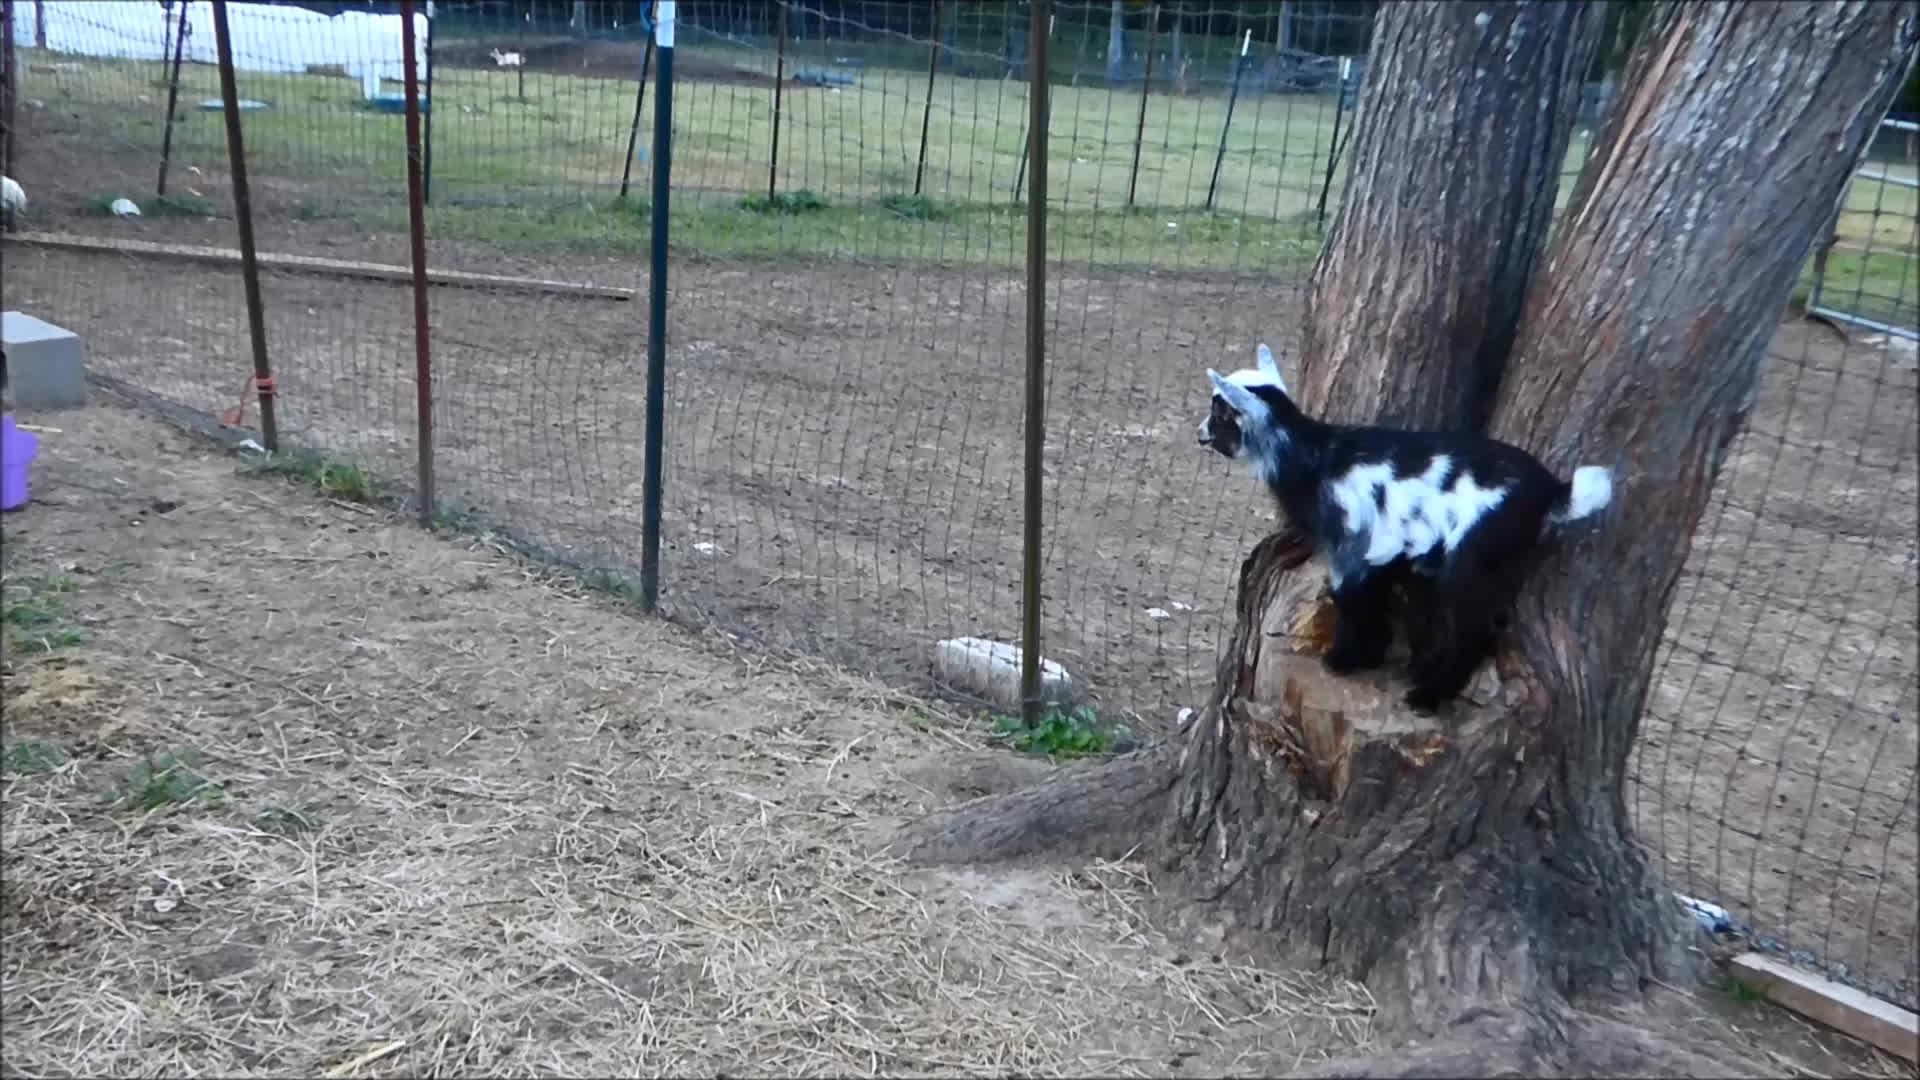 Goatparkour, goat, knsfarm, popular, HOP HOP HOP GIFs